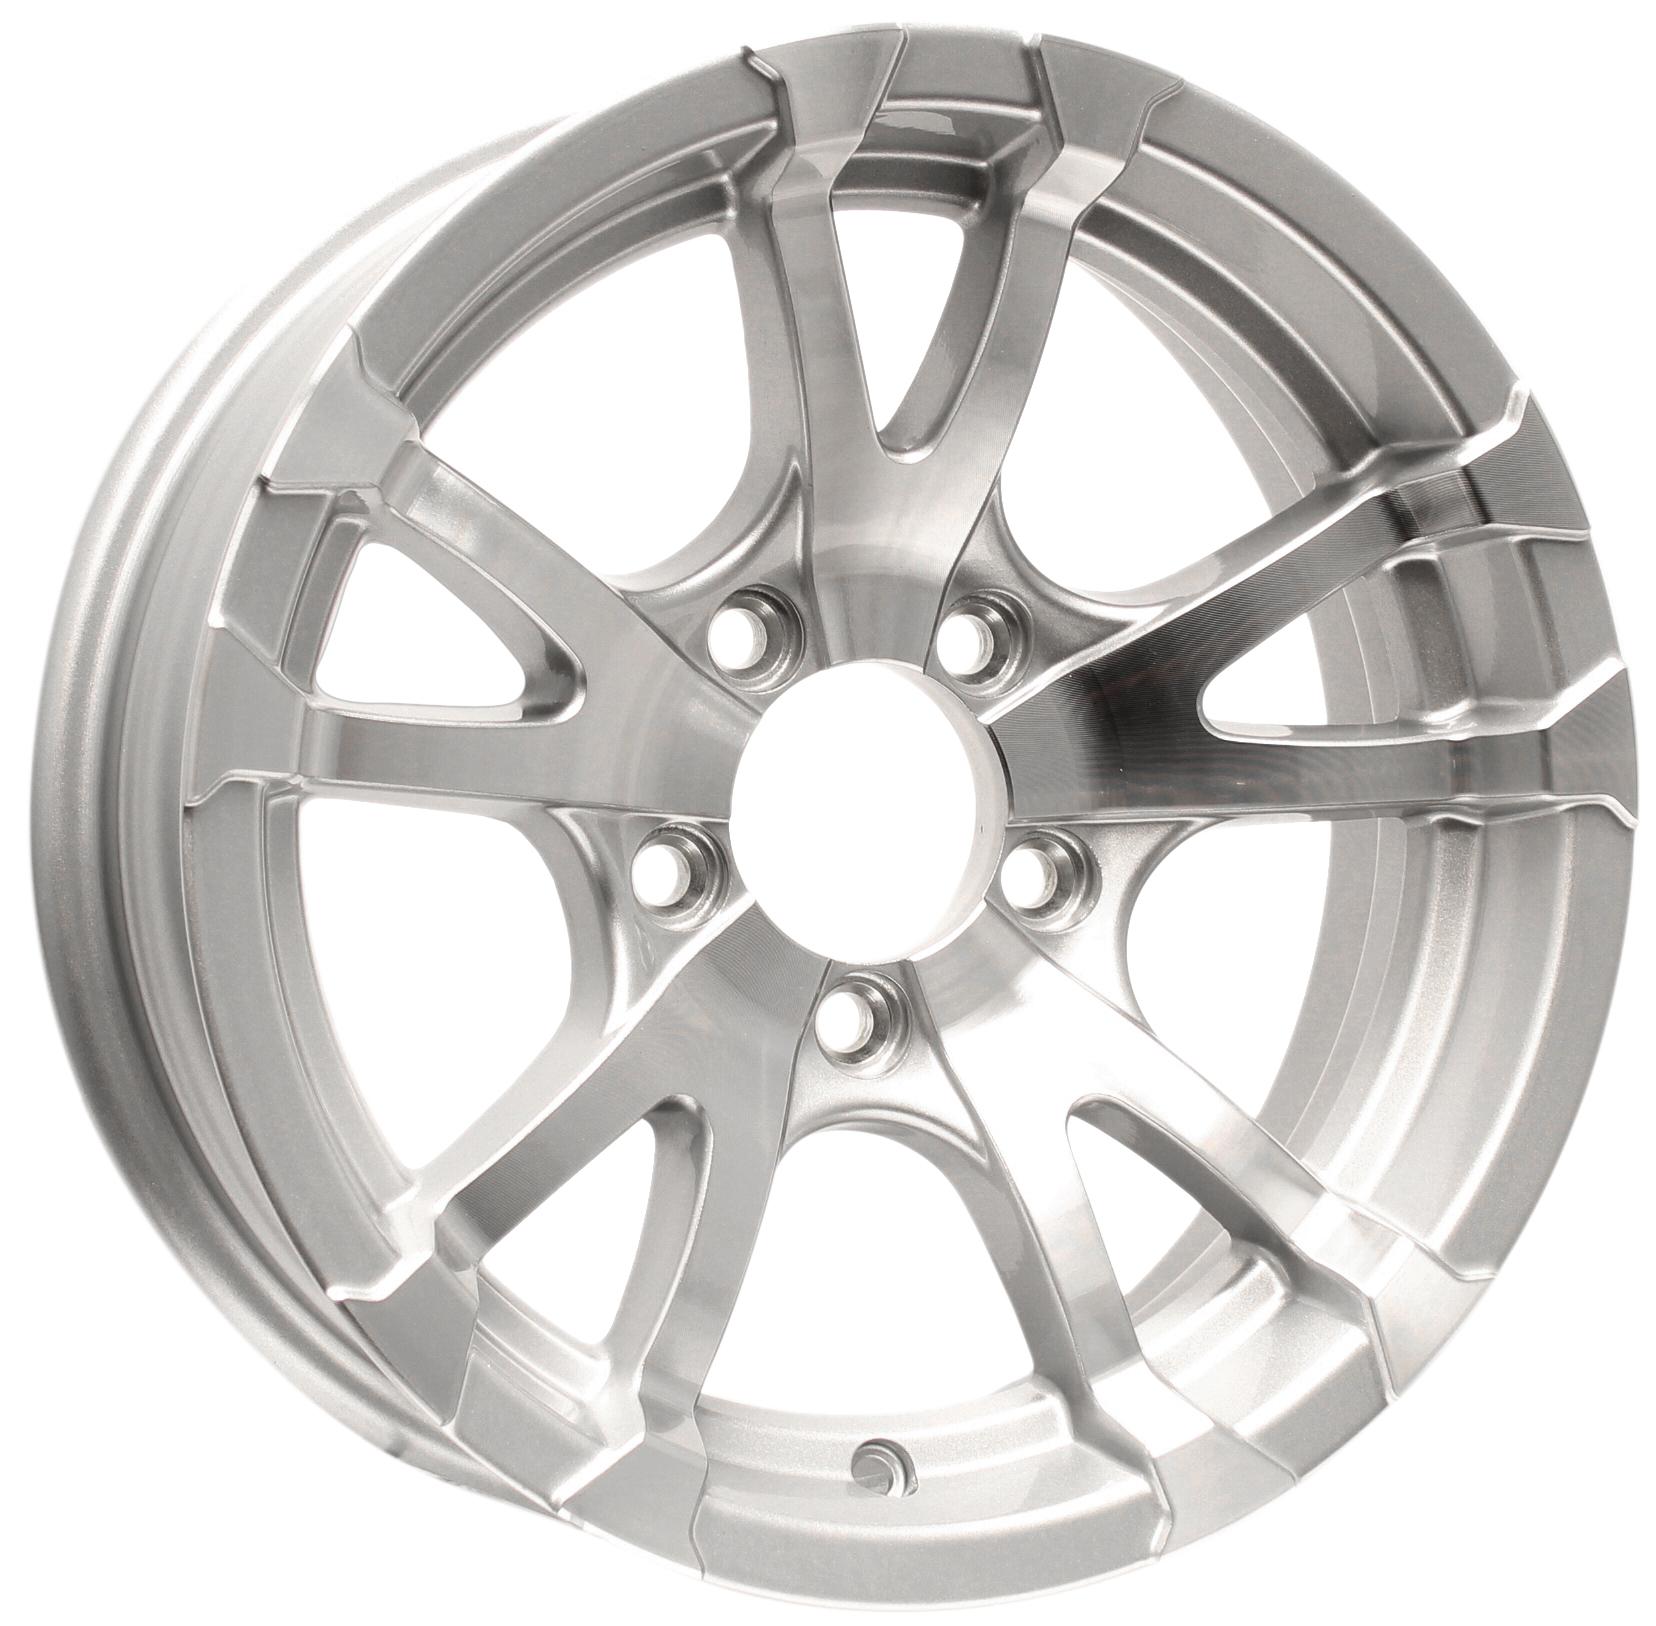 Avalanche 15x5 5-4.5 Silver Aluminum Trailer Wheel Image